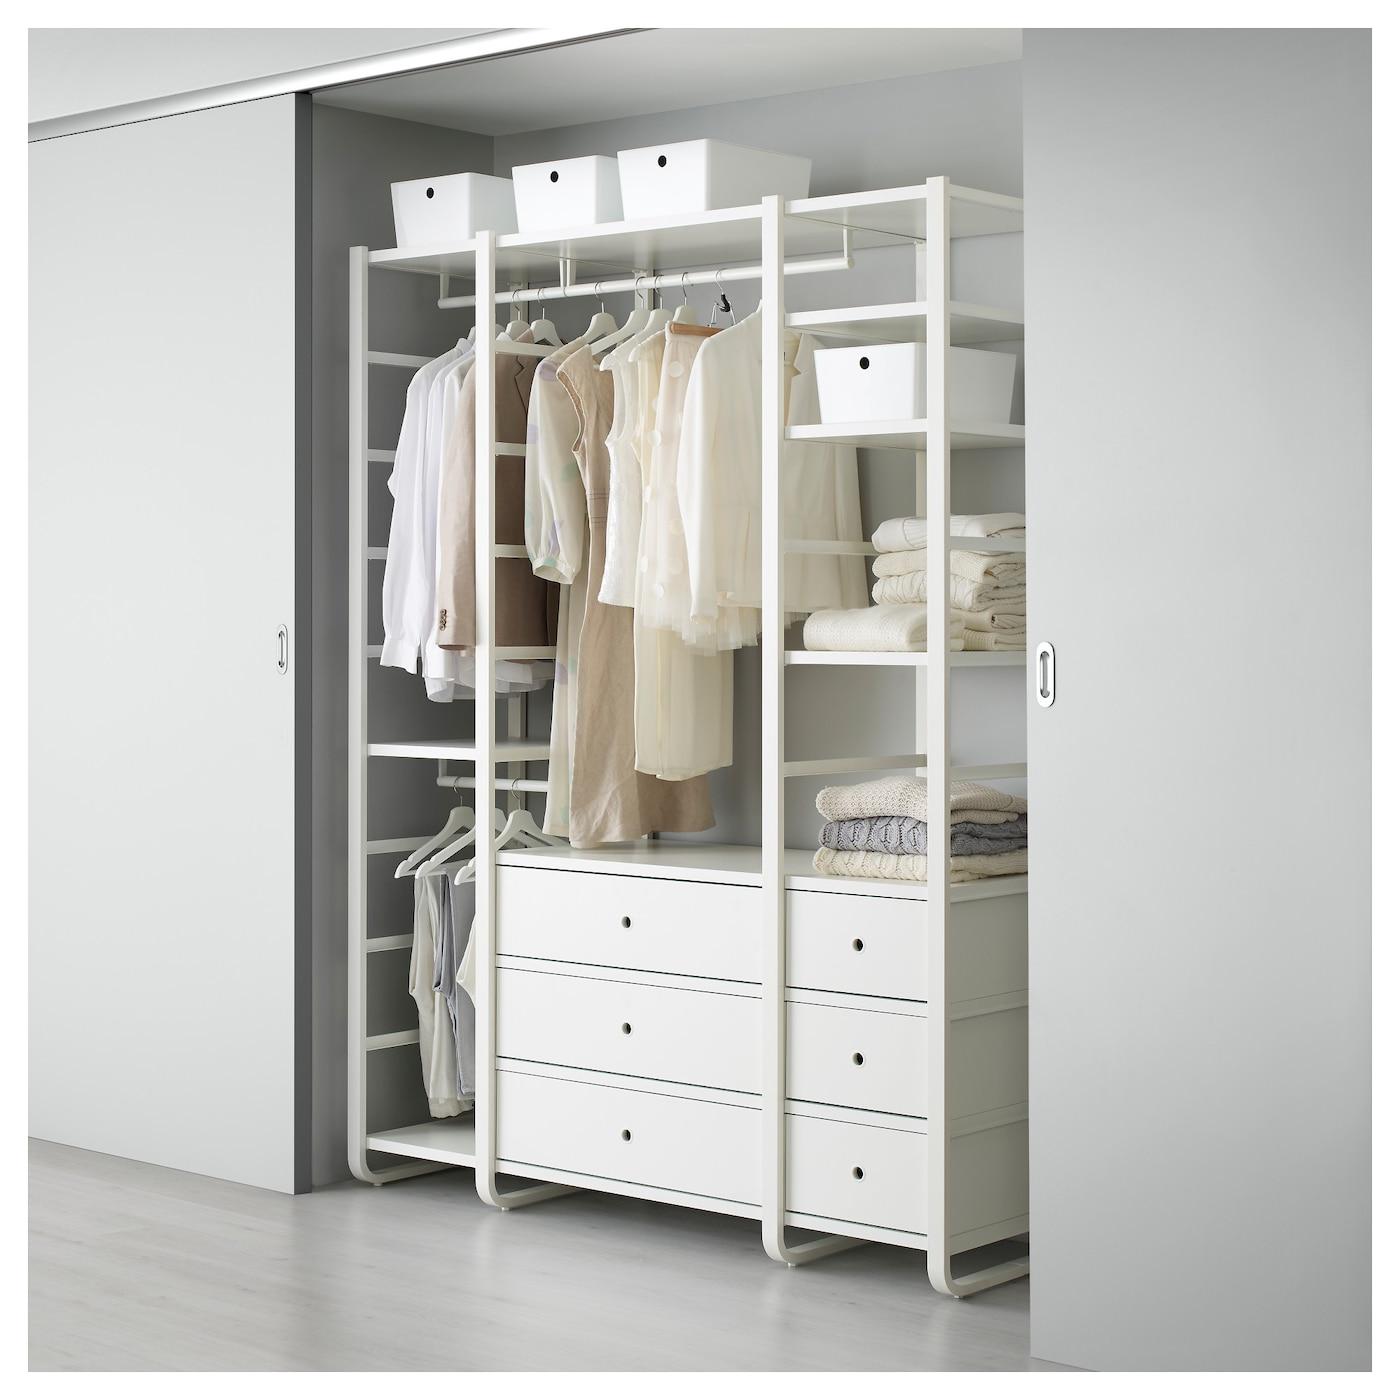 elvarli 3 elementen wit 165x55x216 cm ikea. Black Bedroom Furniture Sets. Home Design Ideas